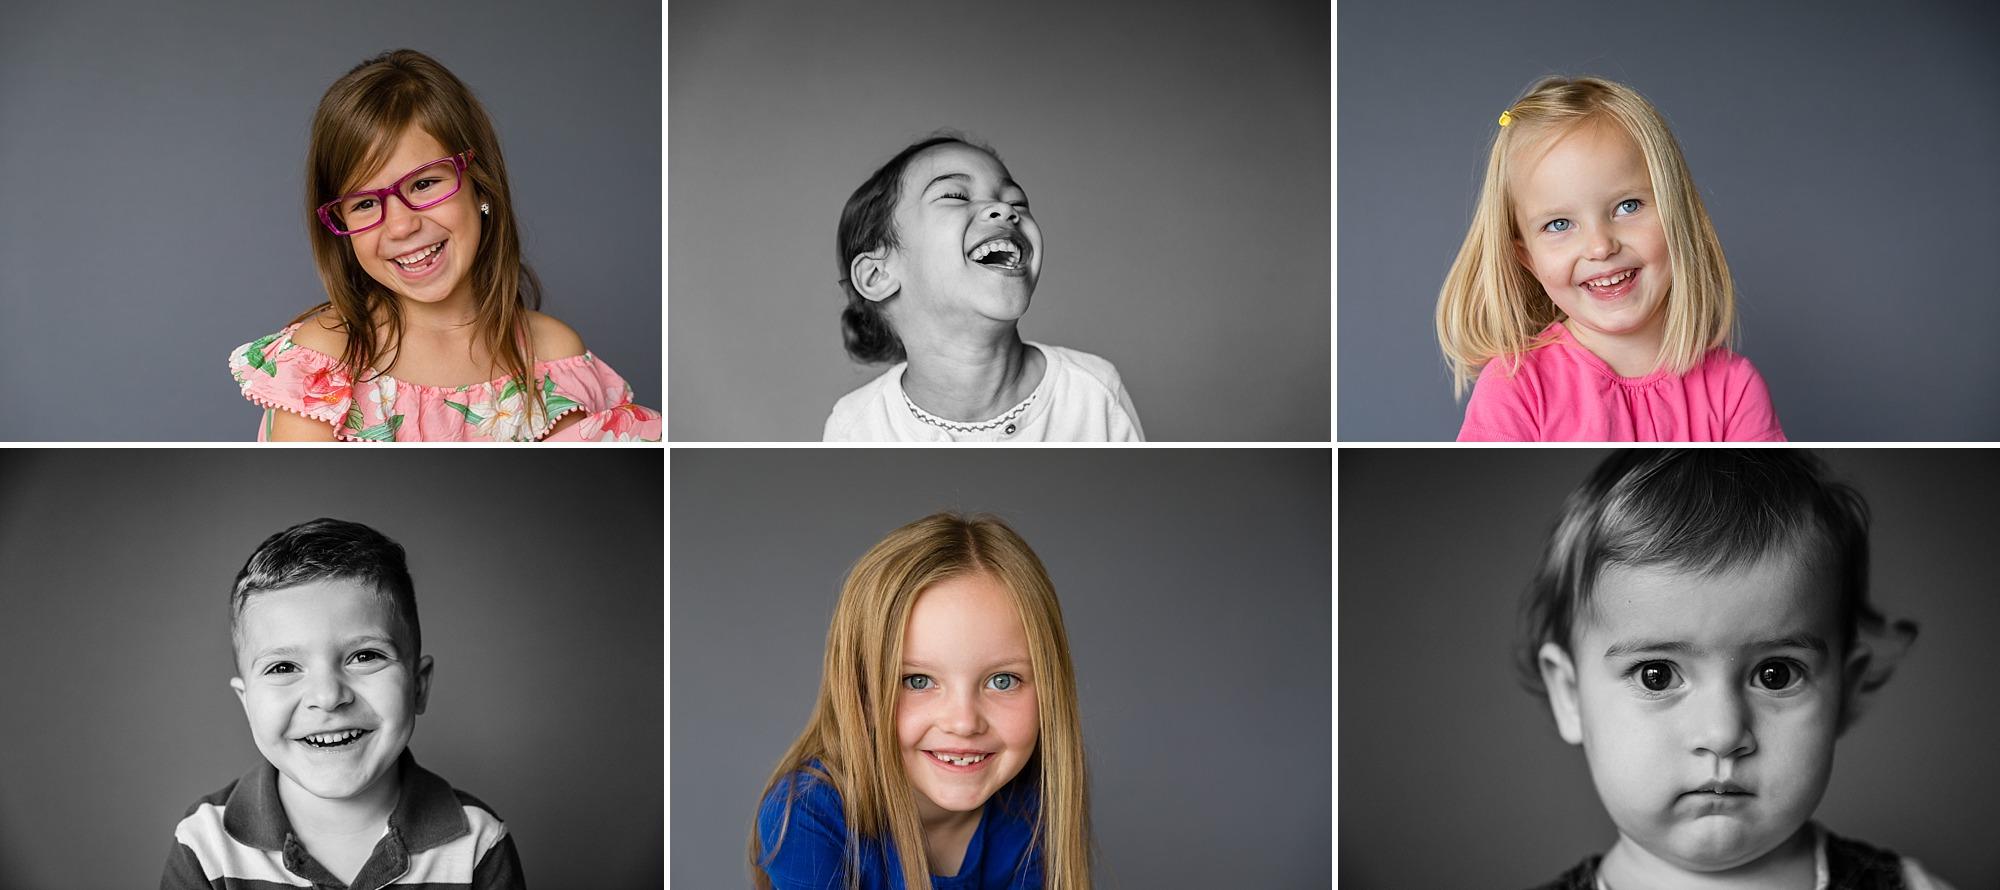 Modern_Childrens_Portraits_Hunnicutt_Photography_Collages_0015